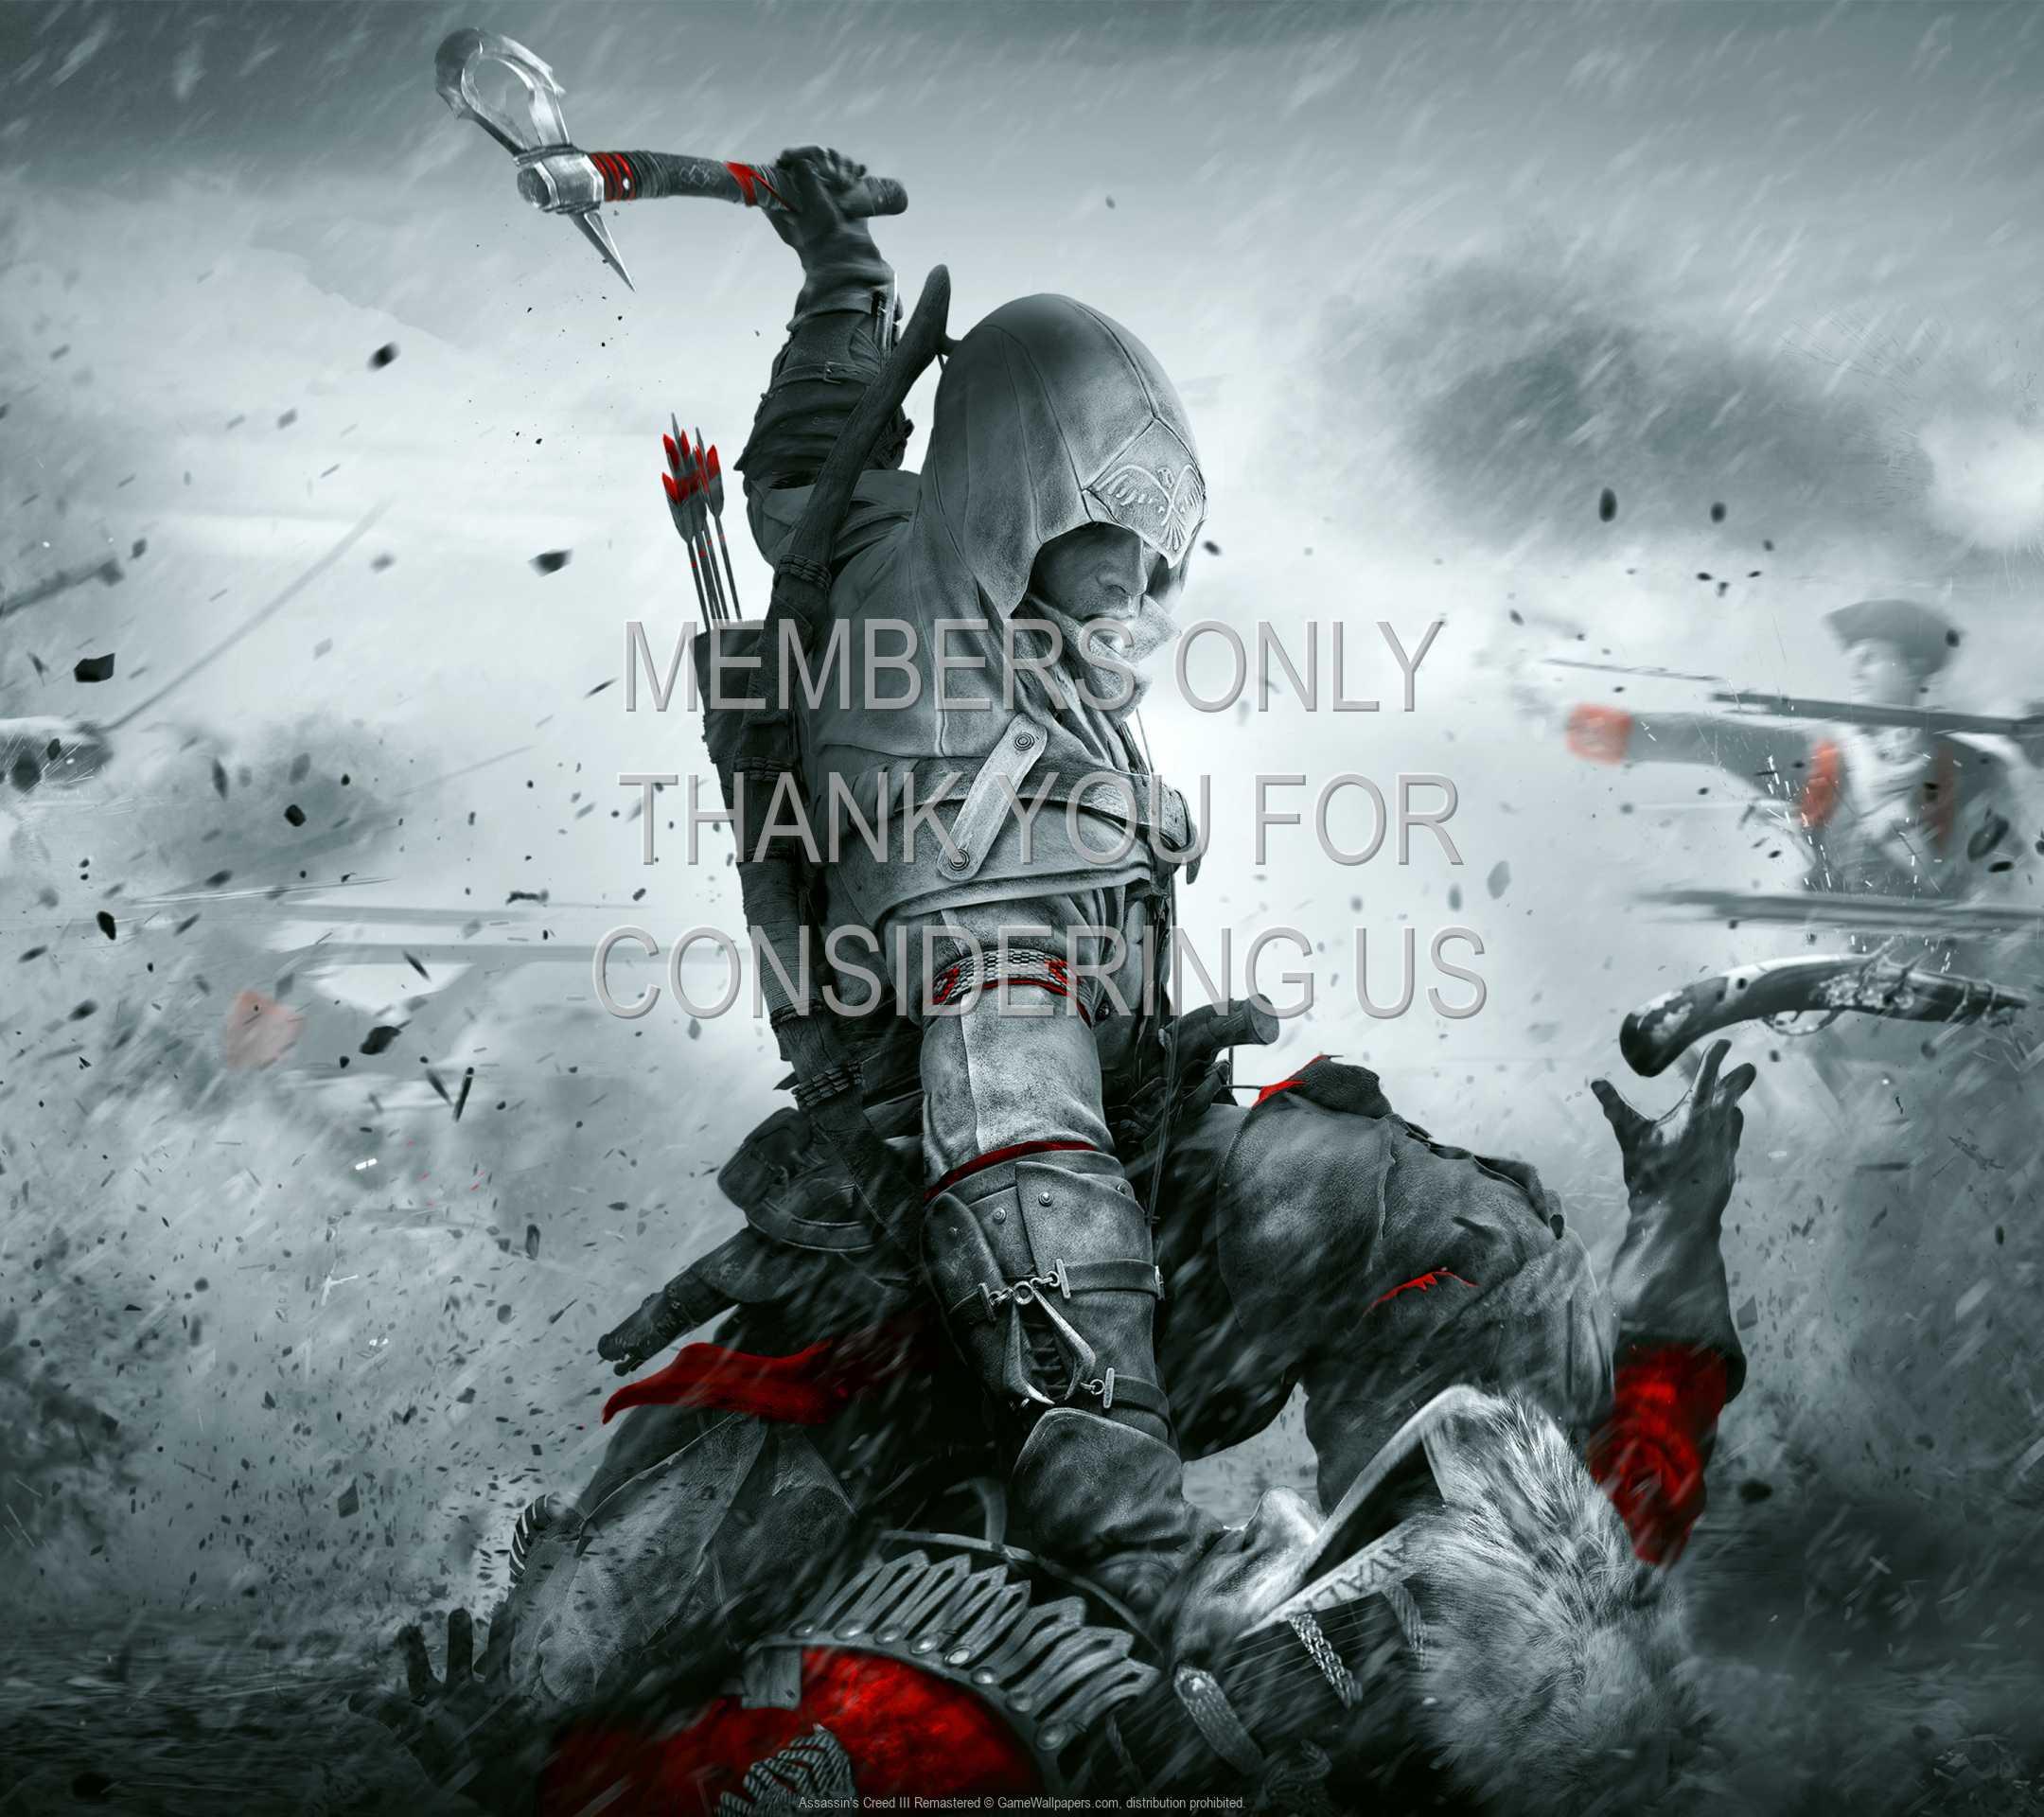 Assassin's Creed III: Remastered 1080p Horizontal Handy Hintergrundbild 01